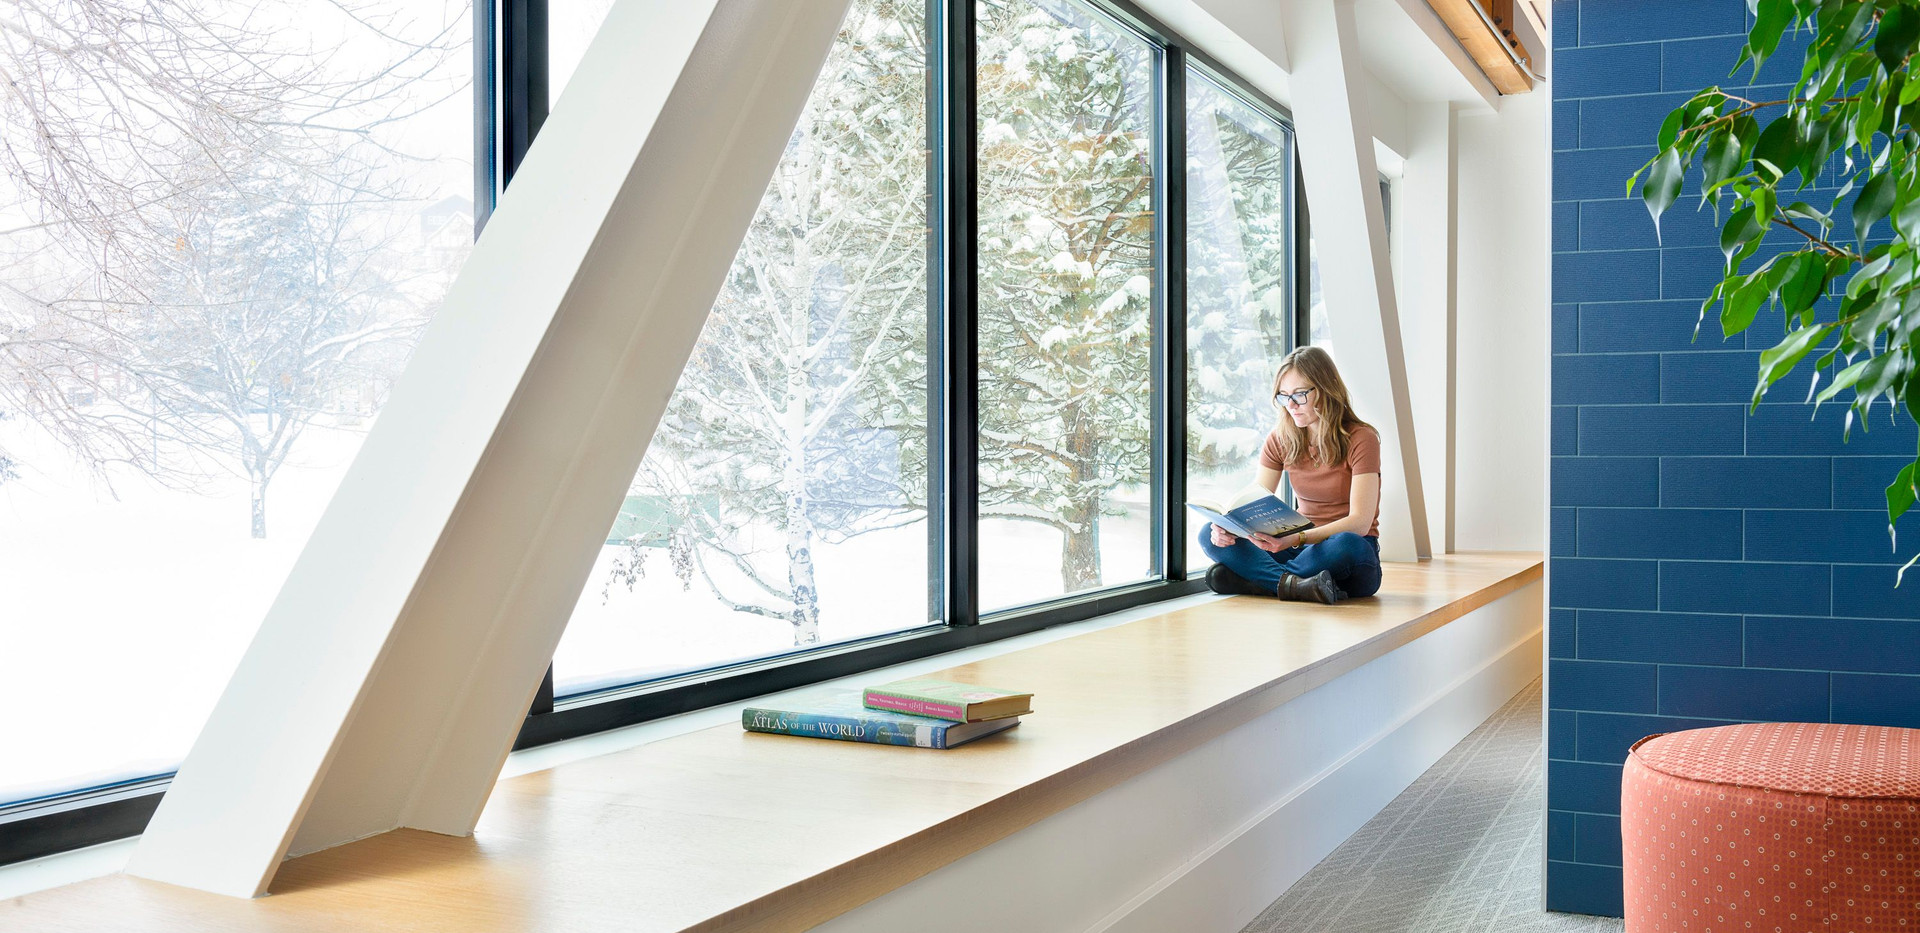 Library-Upstairs-window.jpeg